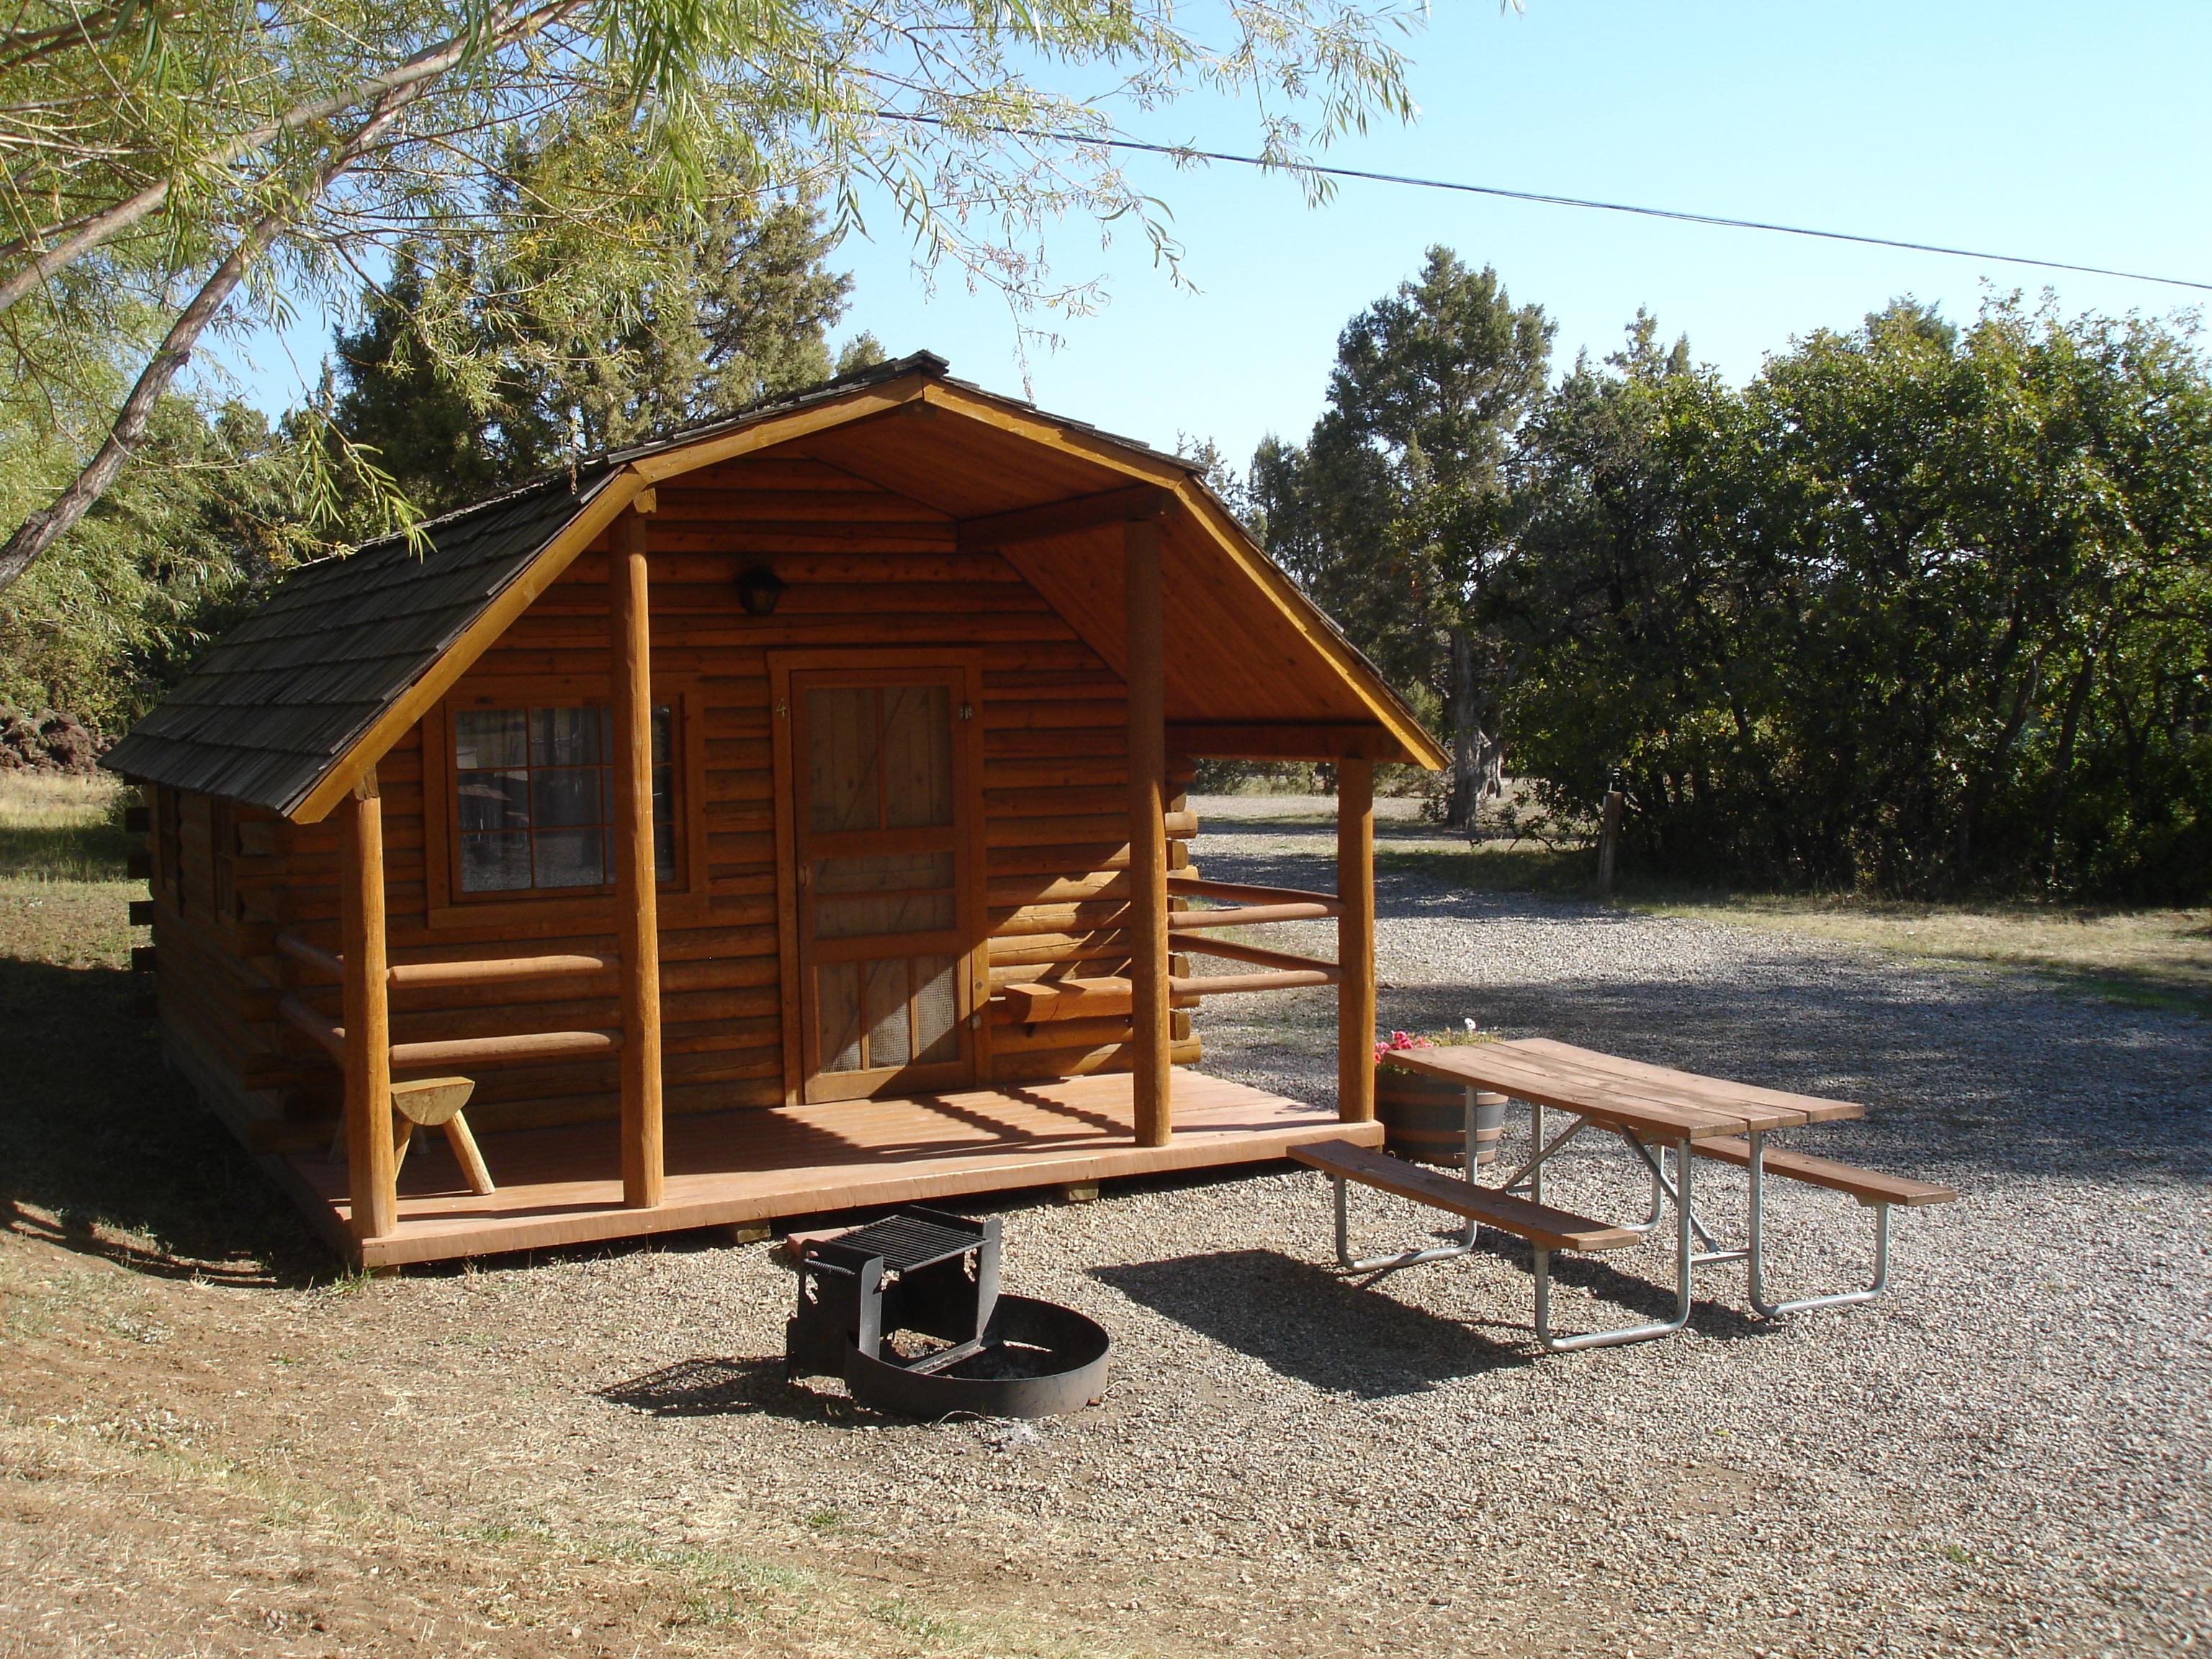 colorado co durango in cabins house luxury tiny